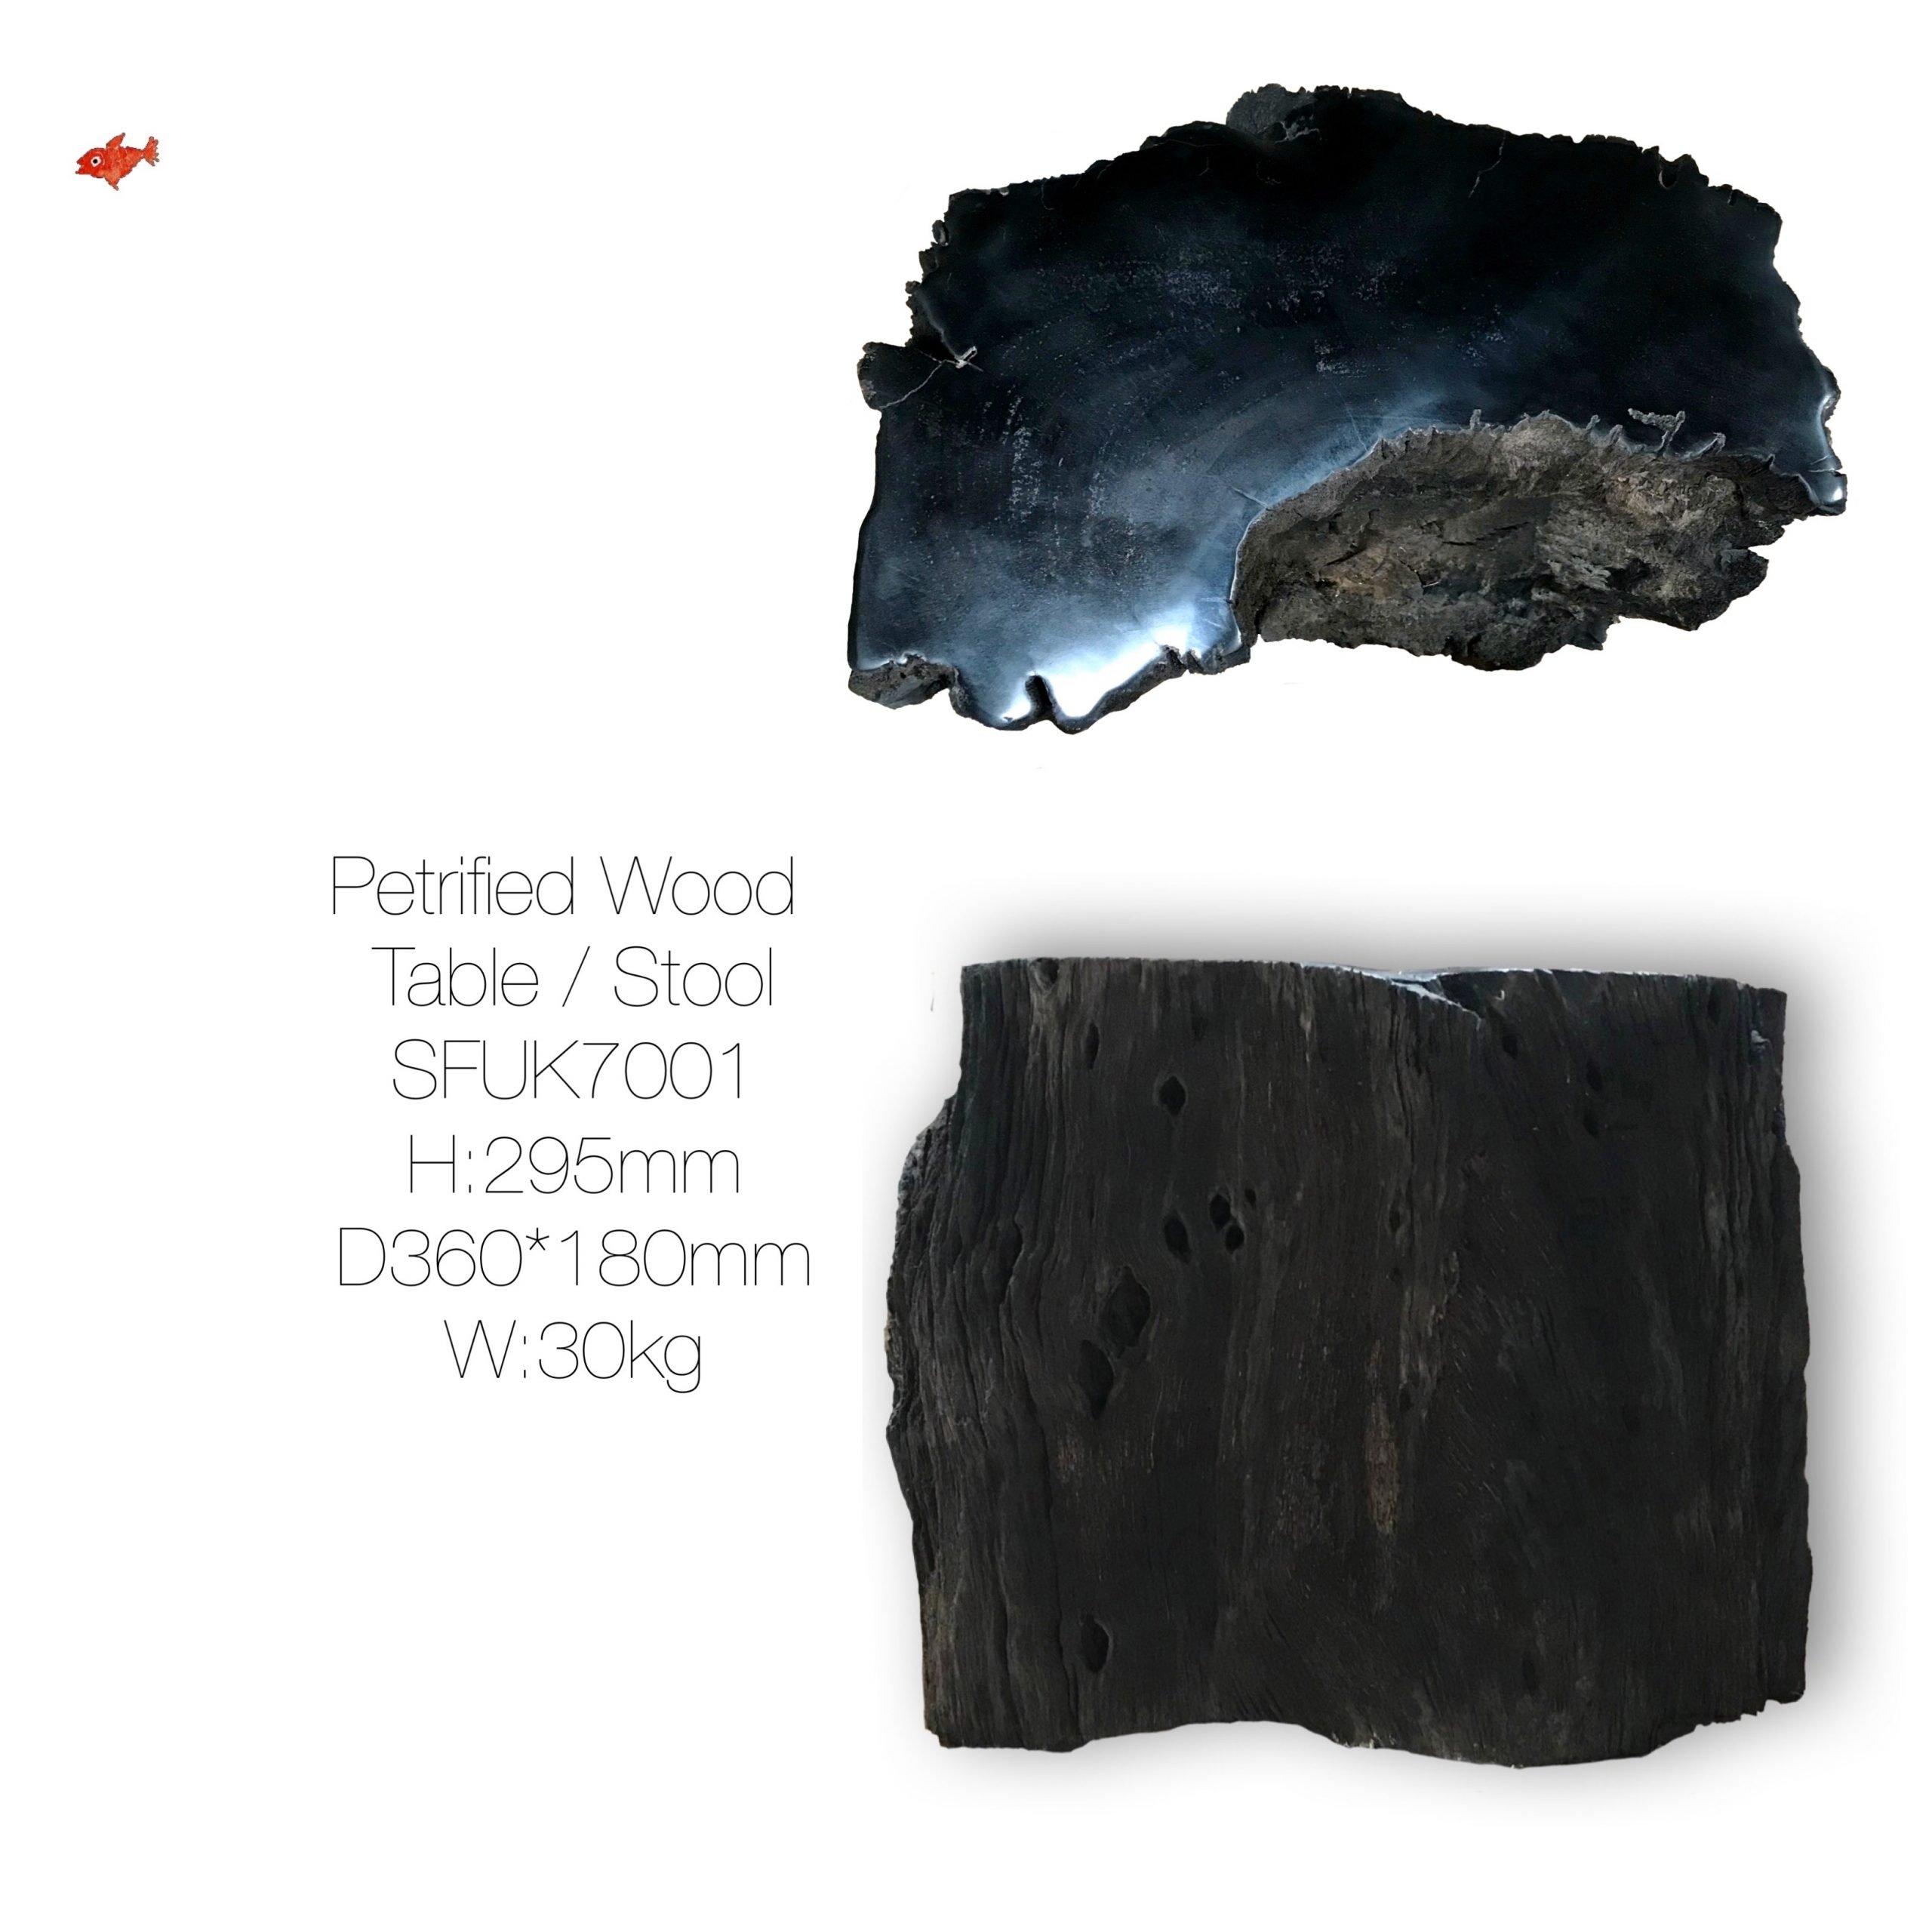 Black Petrified Wood Table Stool